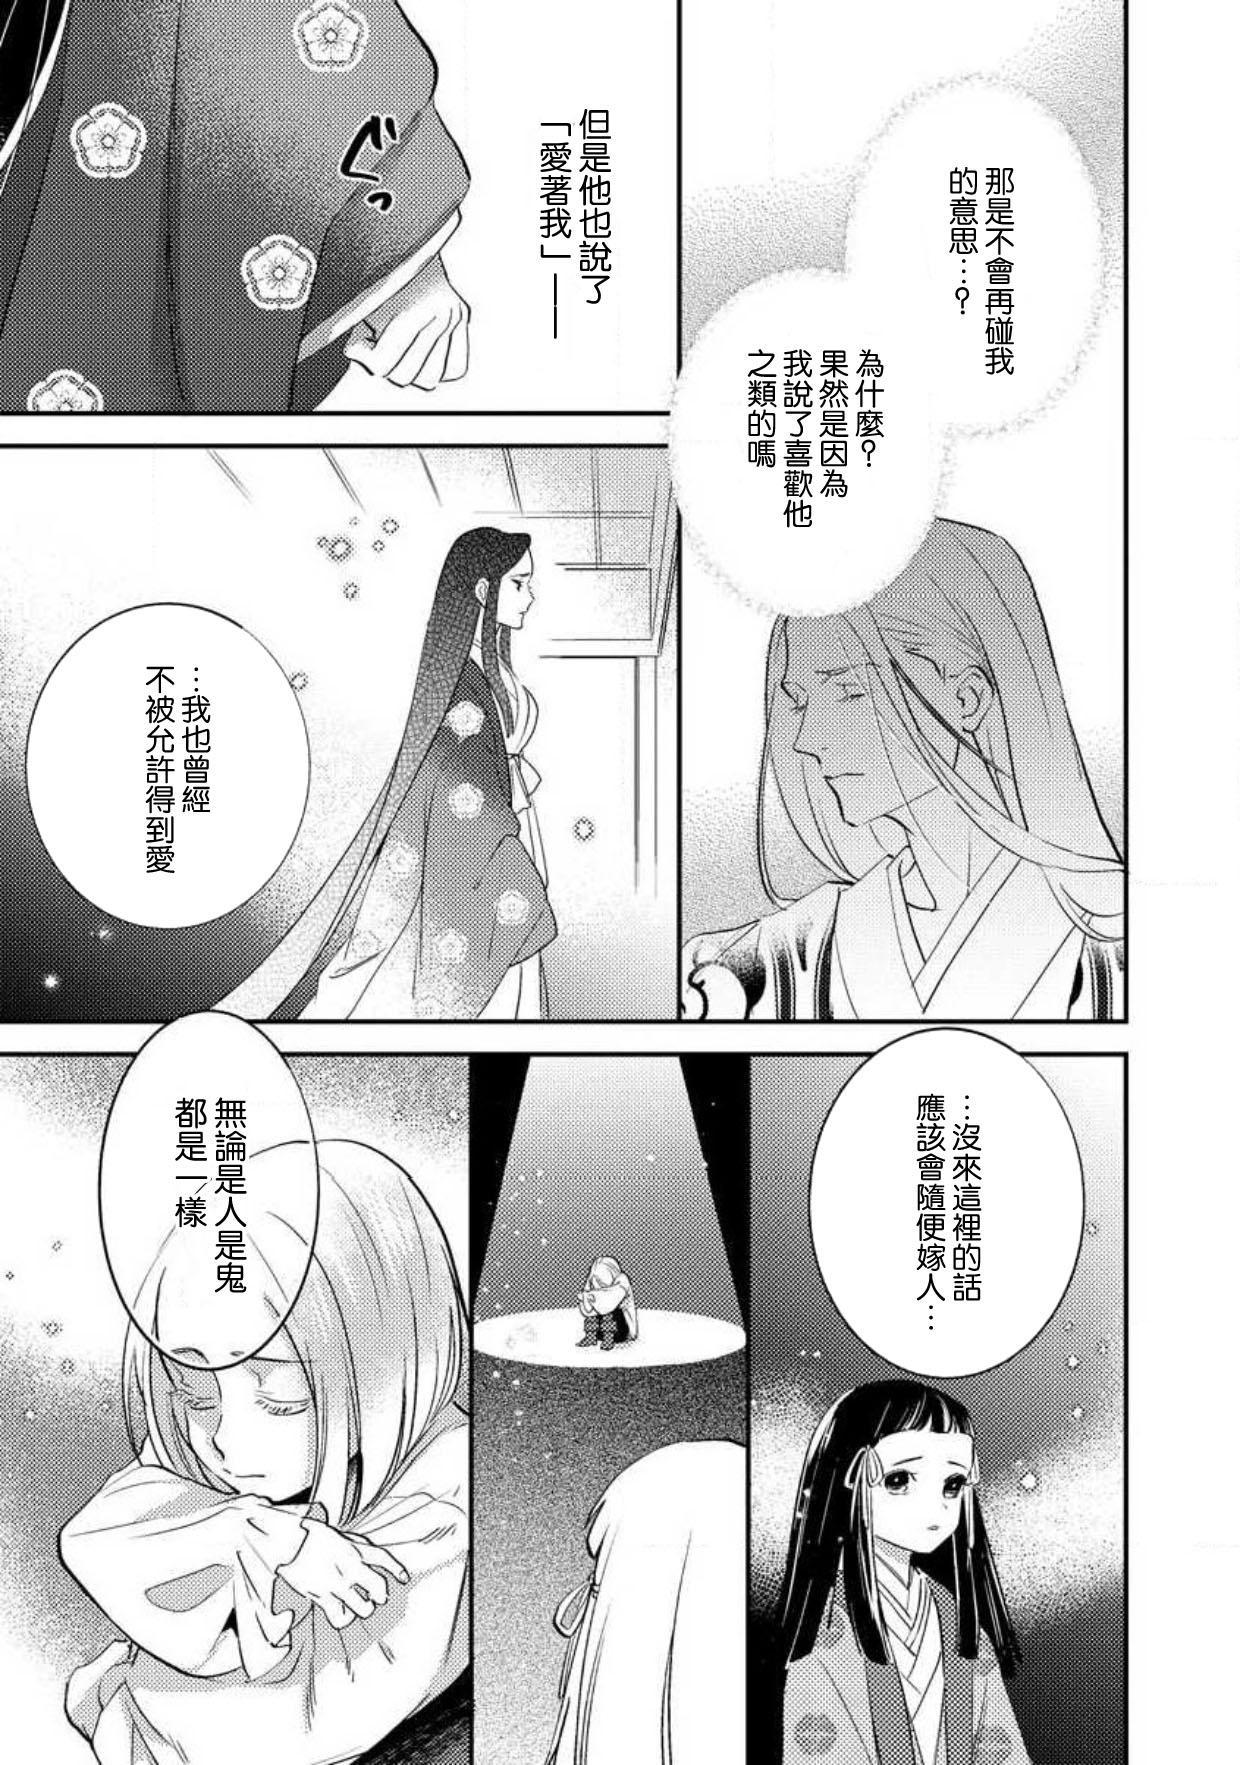 Oeyama suimutan utsukushiki oni no toraware hime | 大江山醉夢逸話 美麗的鬼與被囚禁的公主 Ch. 1-8 174